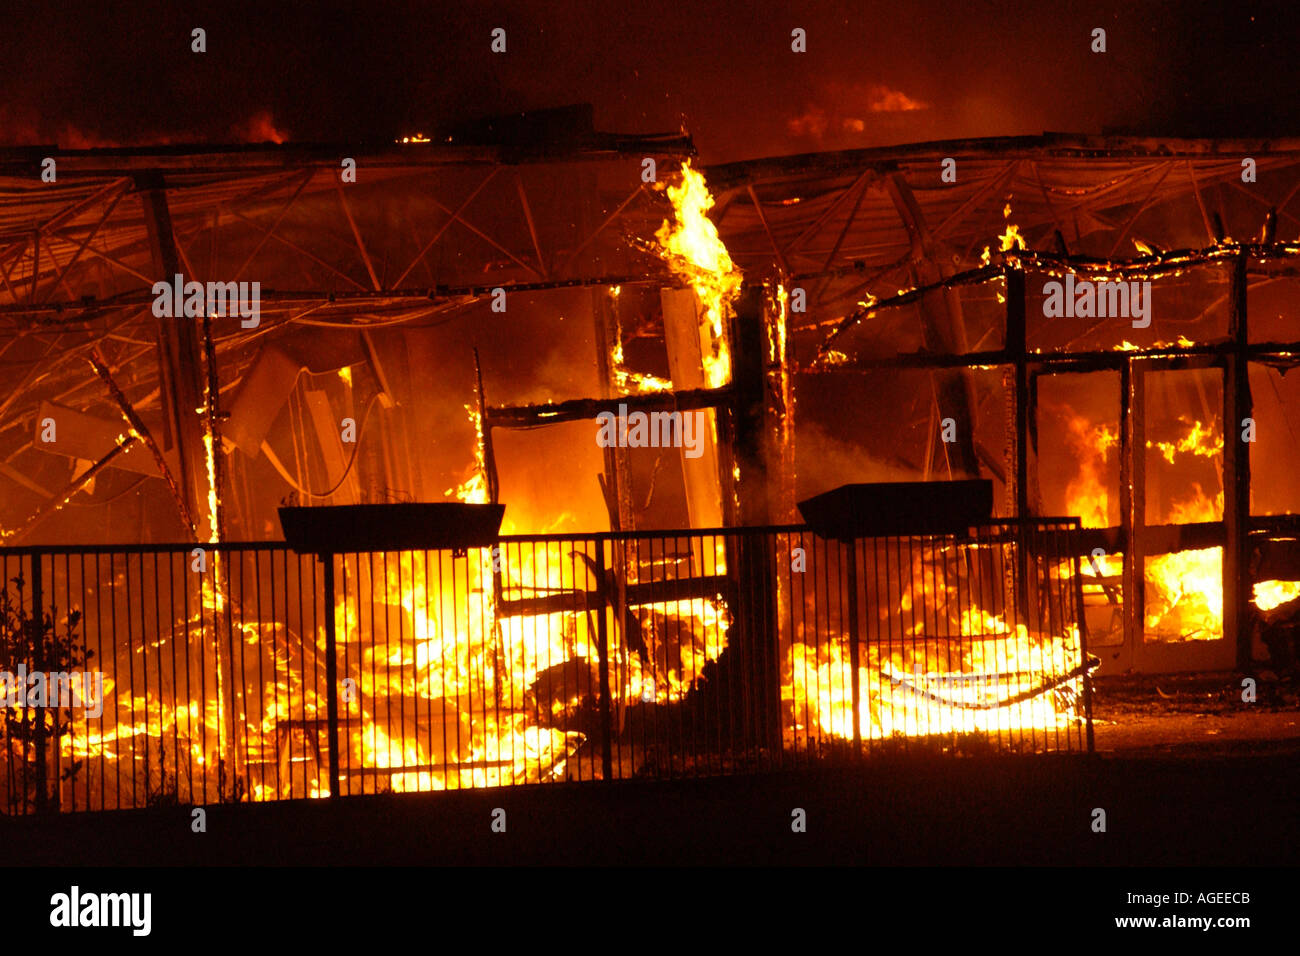 Blaze in progress which destroyed Rogerstone Primary School Newport Gwent Wales UK Stock Photo